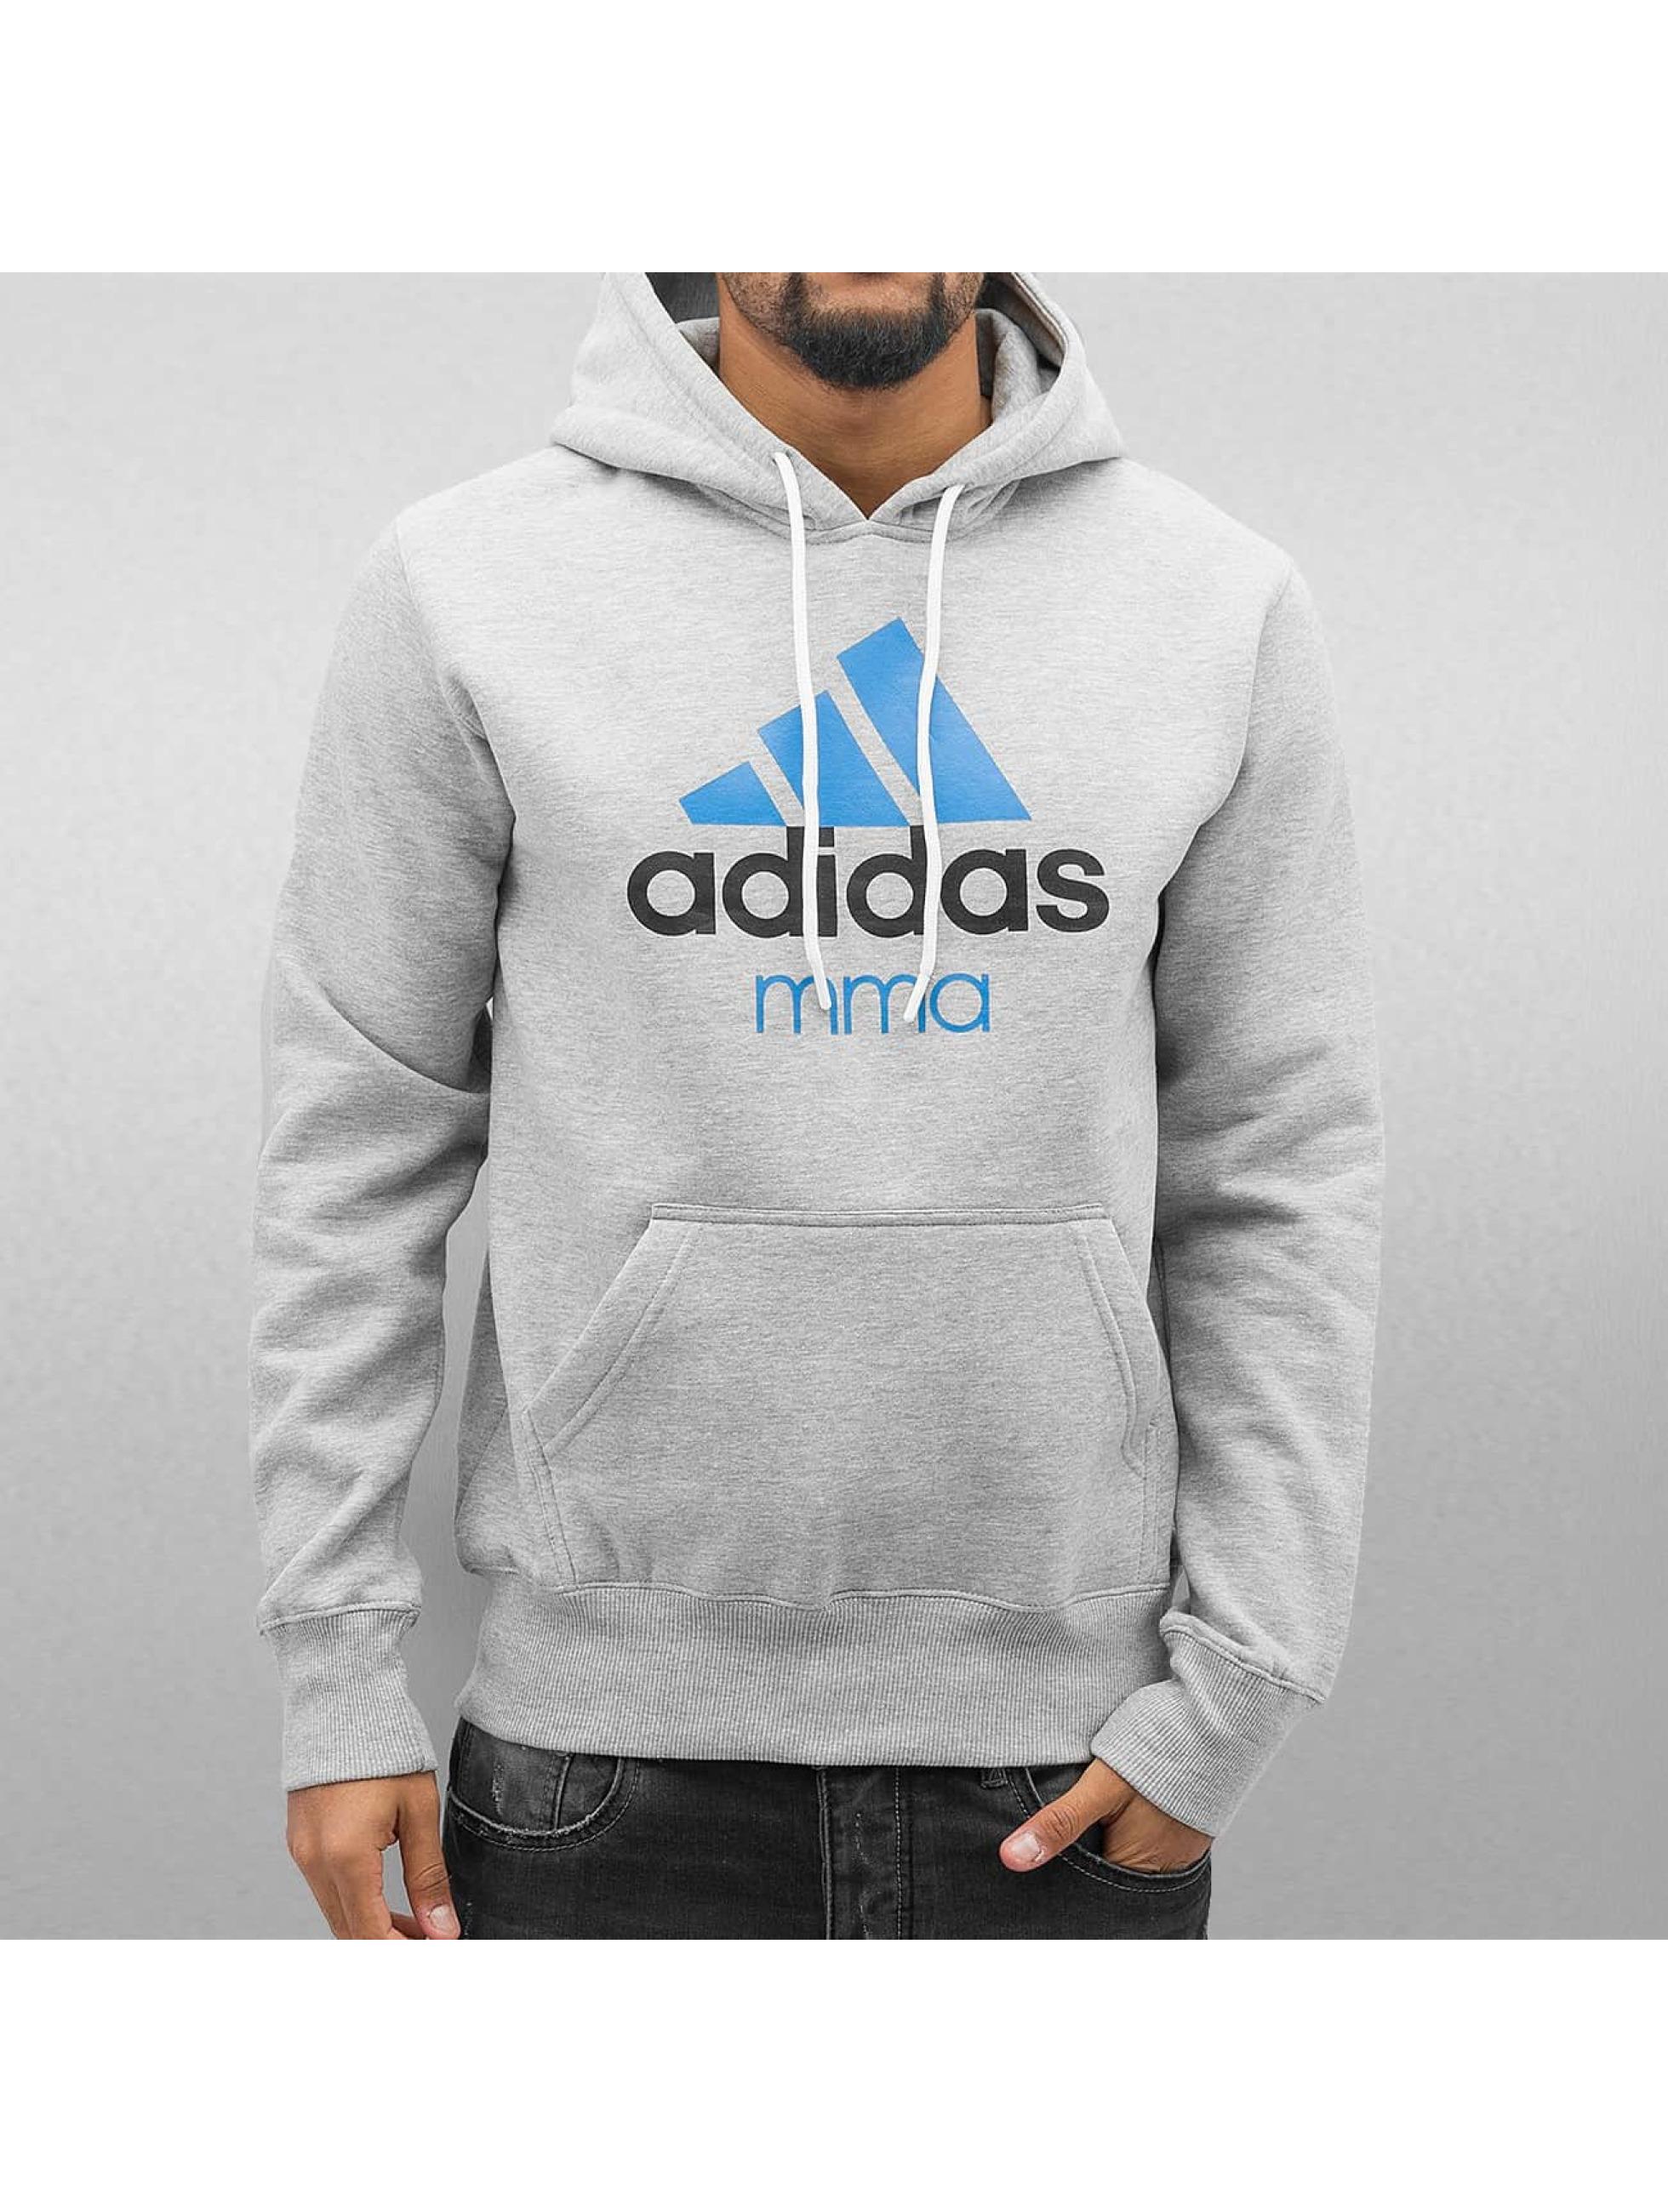 Adidas Boxing MMA Hoodie Community grey